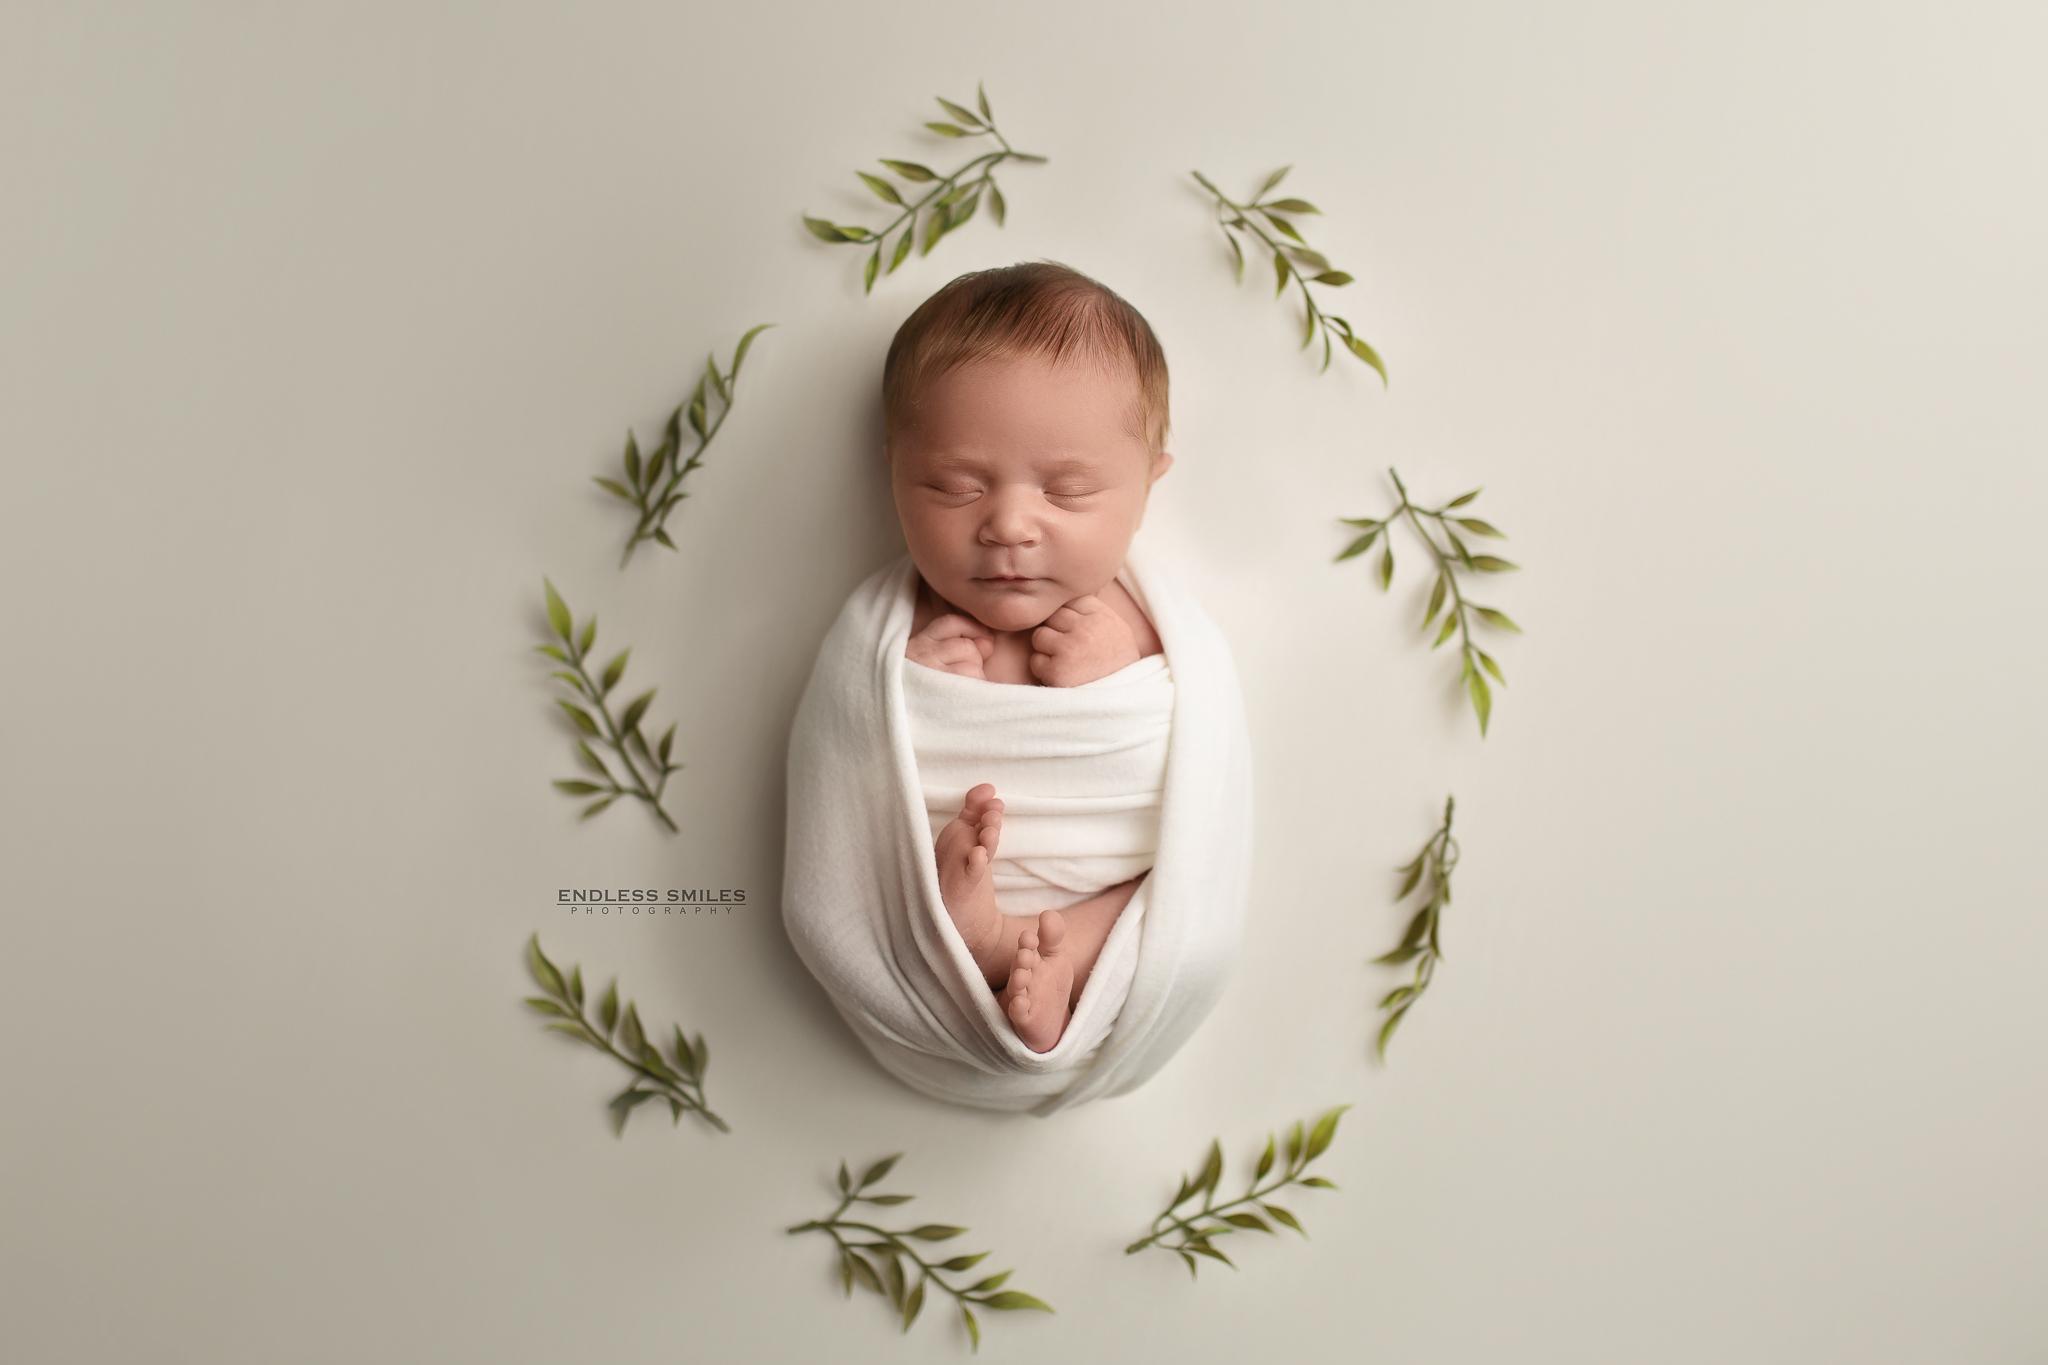 Endless Smiles Photography, Haddonfield Newborn Photographer, Cherry Hill Newborn Photographer, Sout